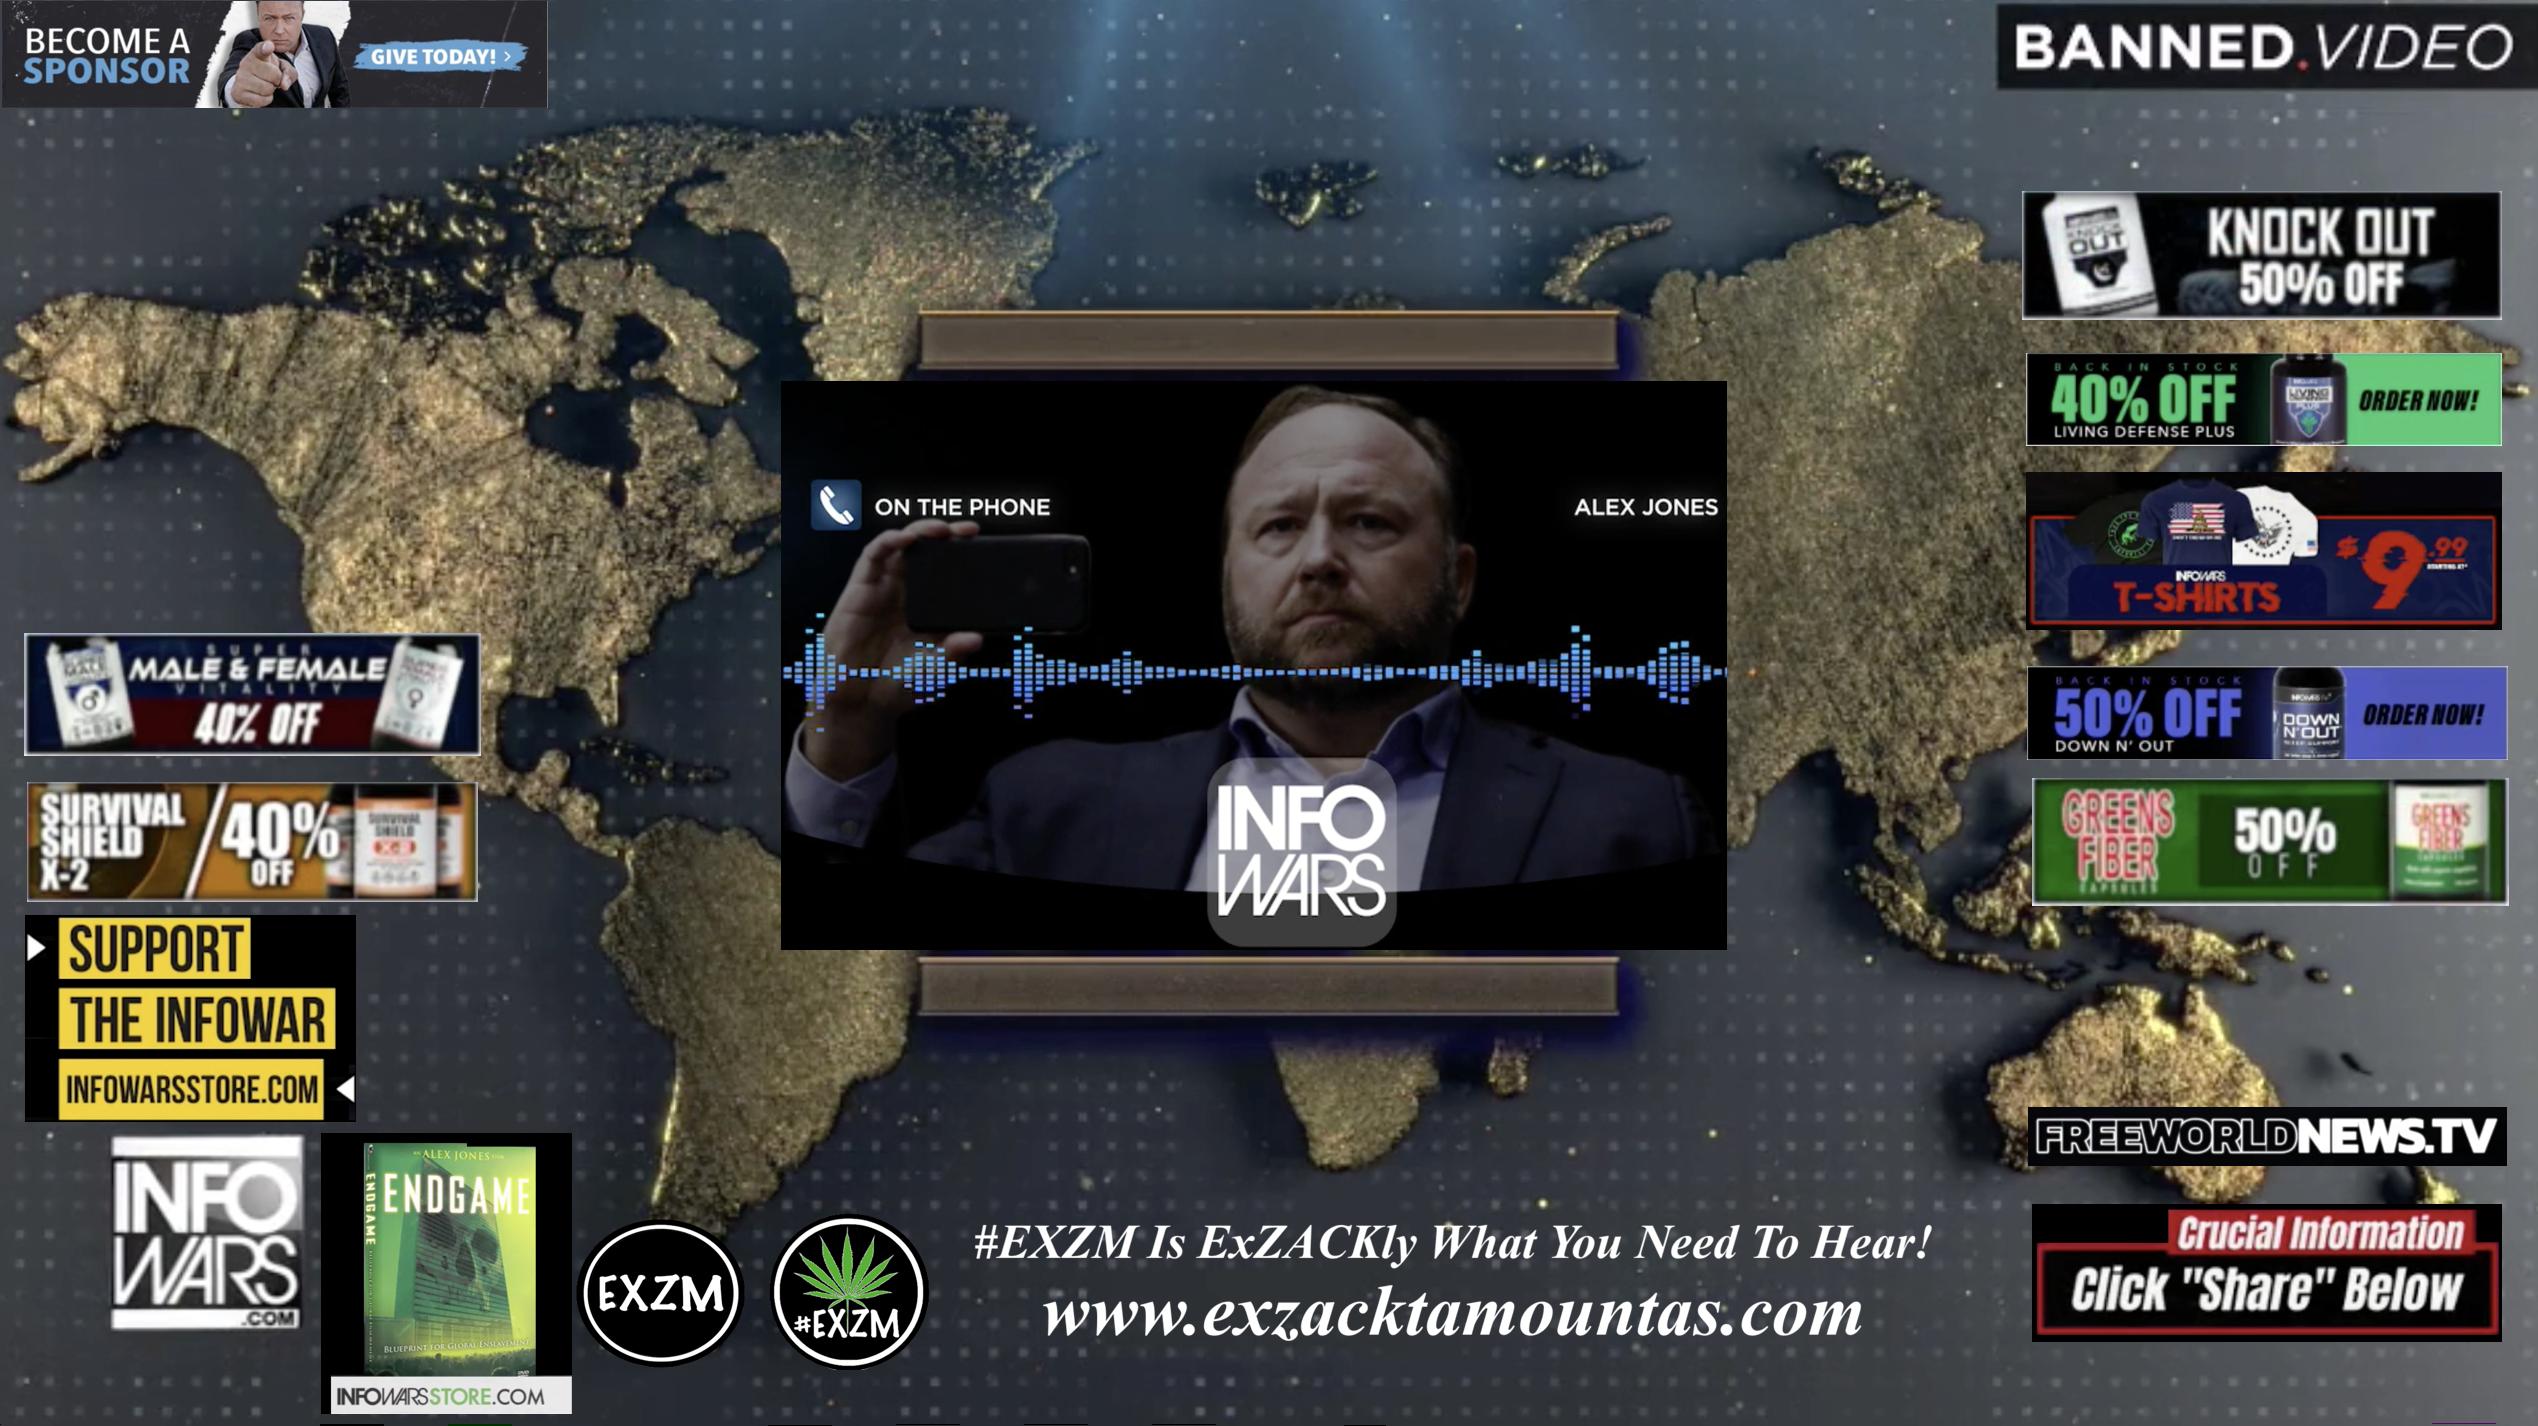 Alex Jones Live In Infowars Studio Free World News TV EXZM Zack Mount October 15th 2021 copy